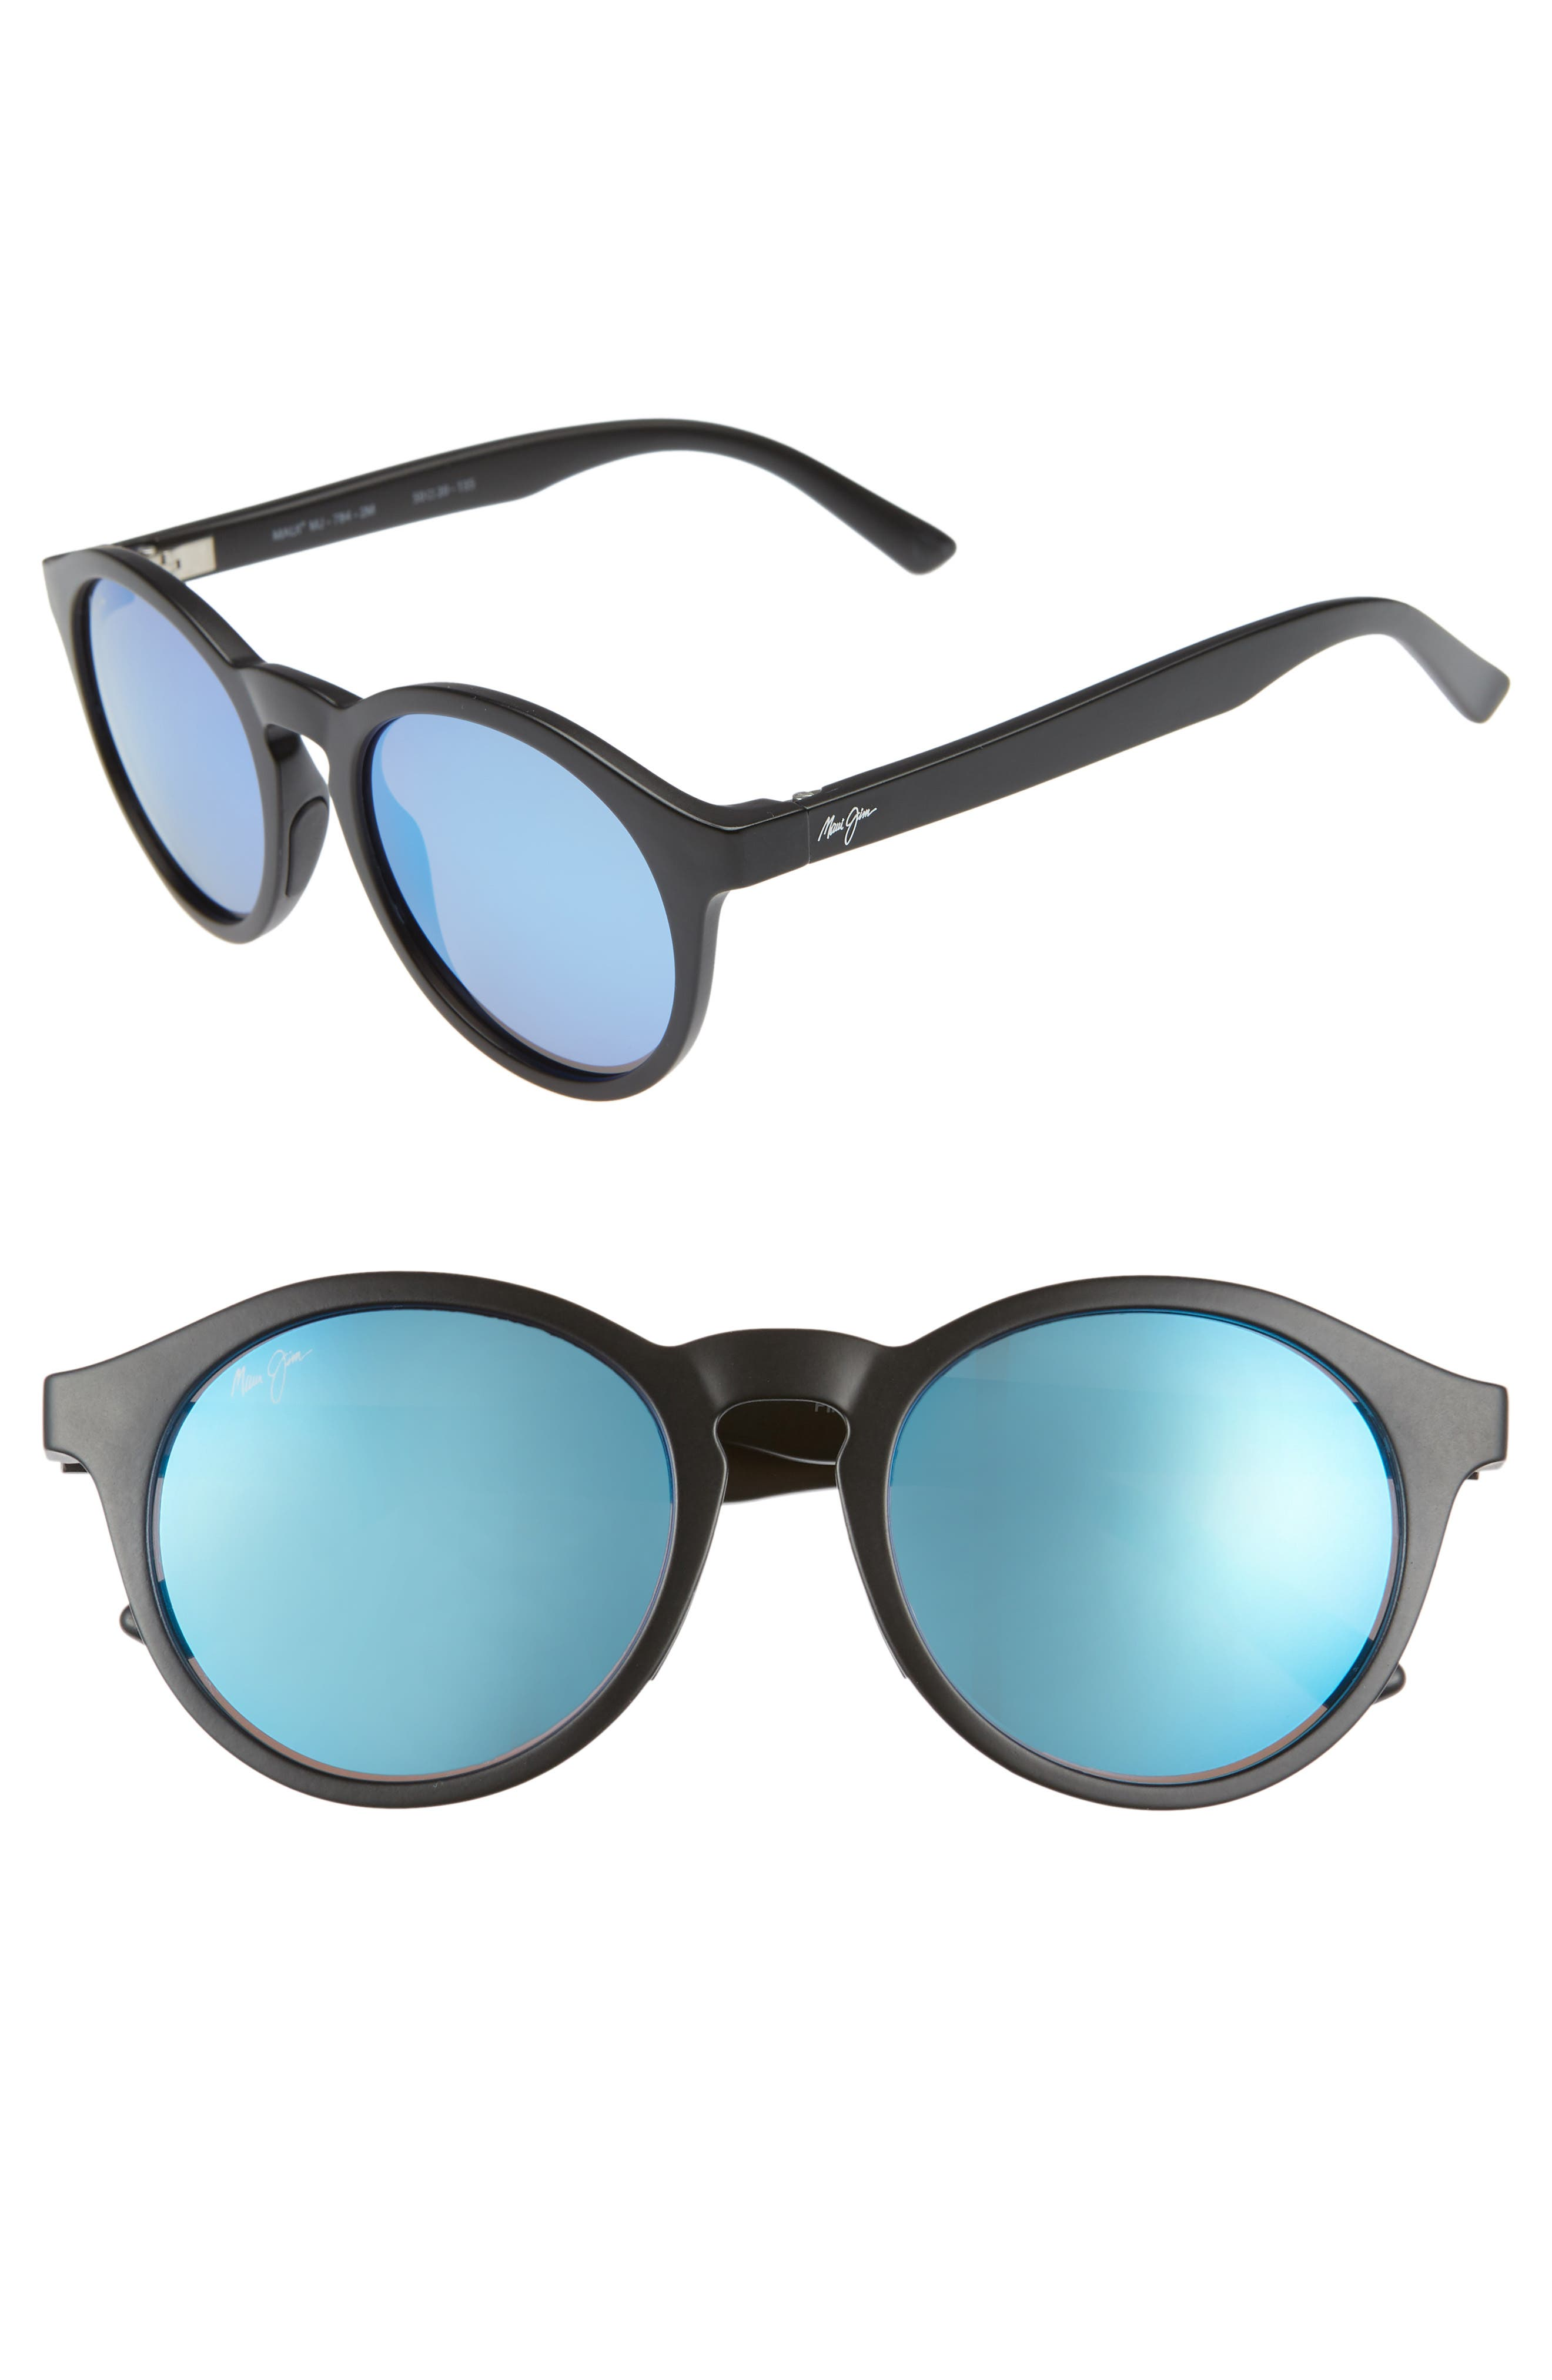 MAUI JIM Pineapple 50Mm Polarized Round Sunglasses - Matte Black